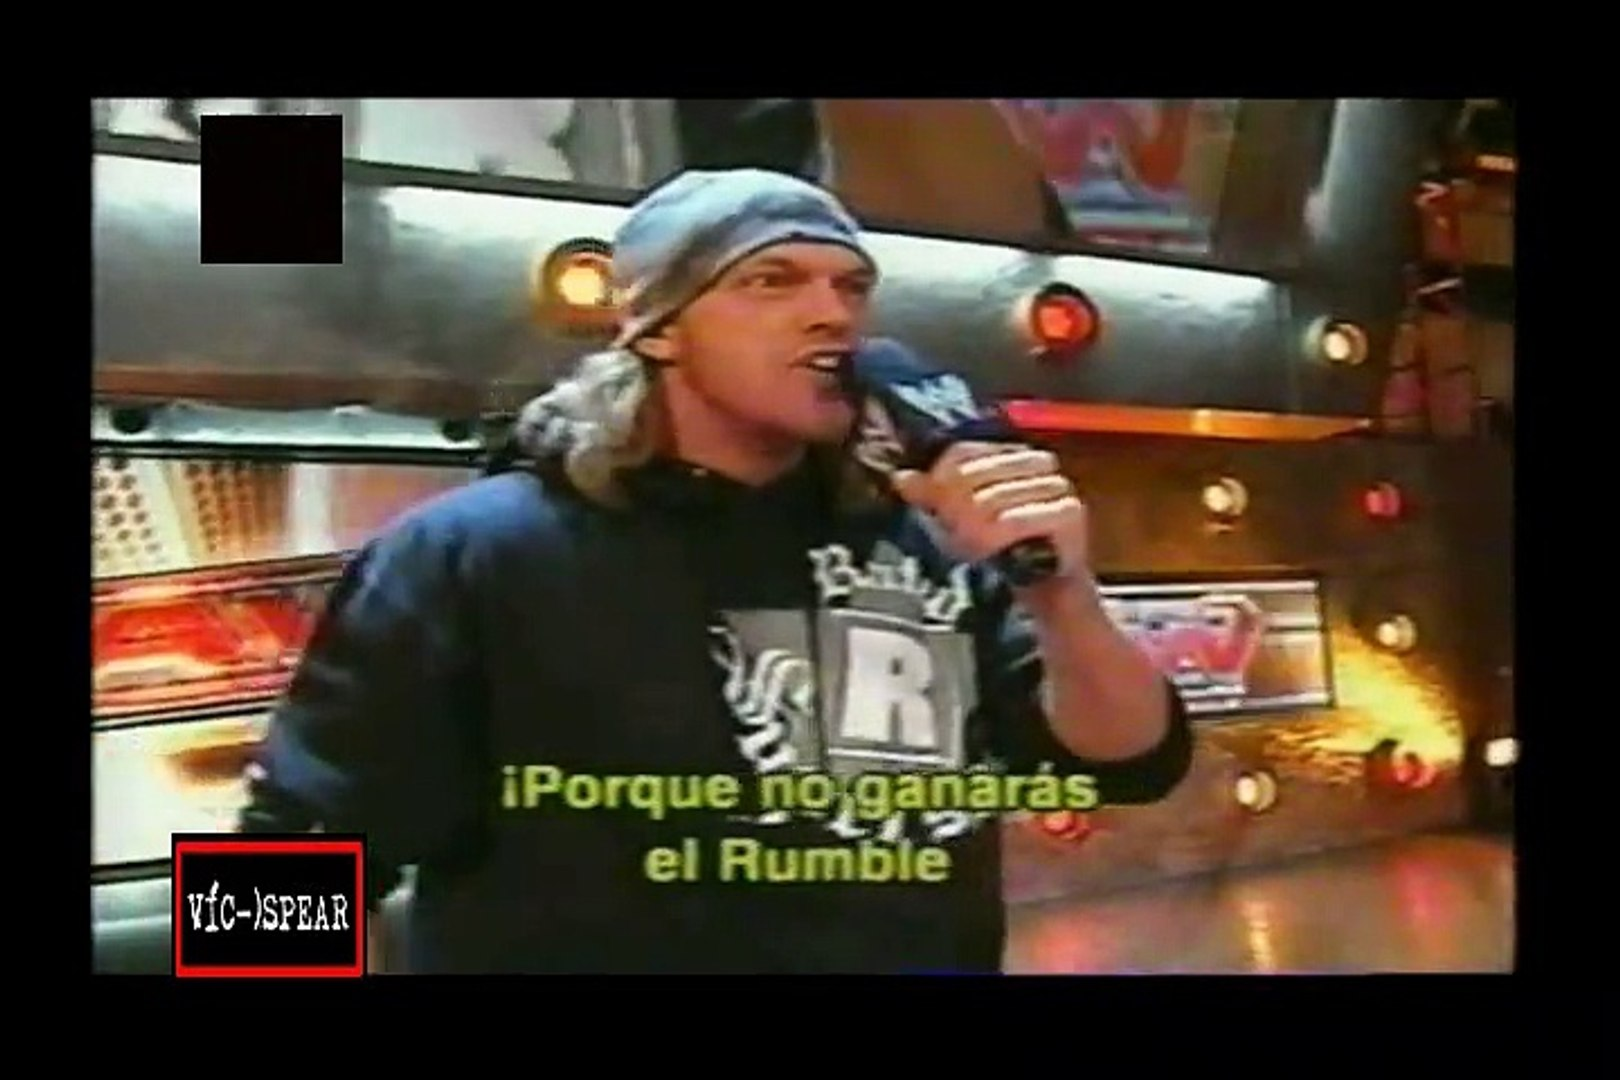 Palabras entre Shawn Michaels & Edge previo a Royal Rumble 2007 - WWE Experience - Sub. En Españ